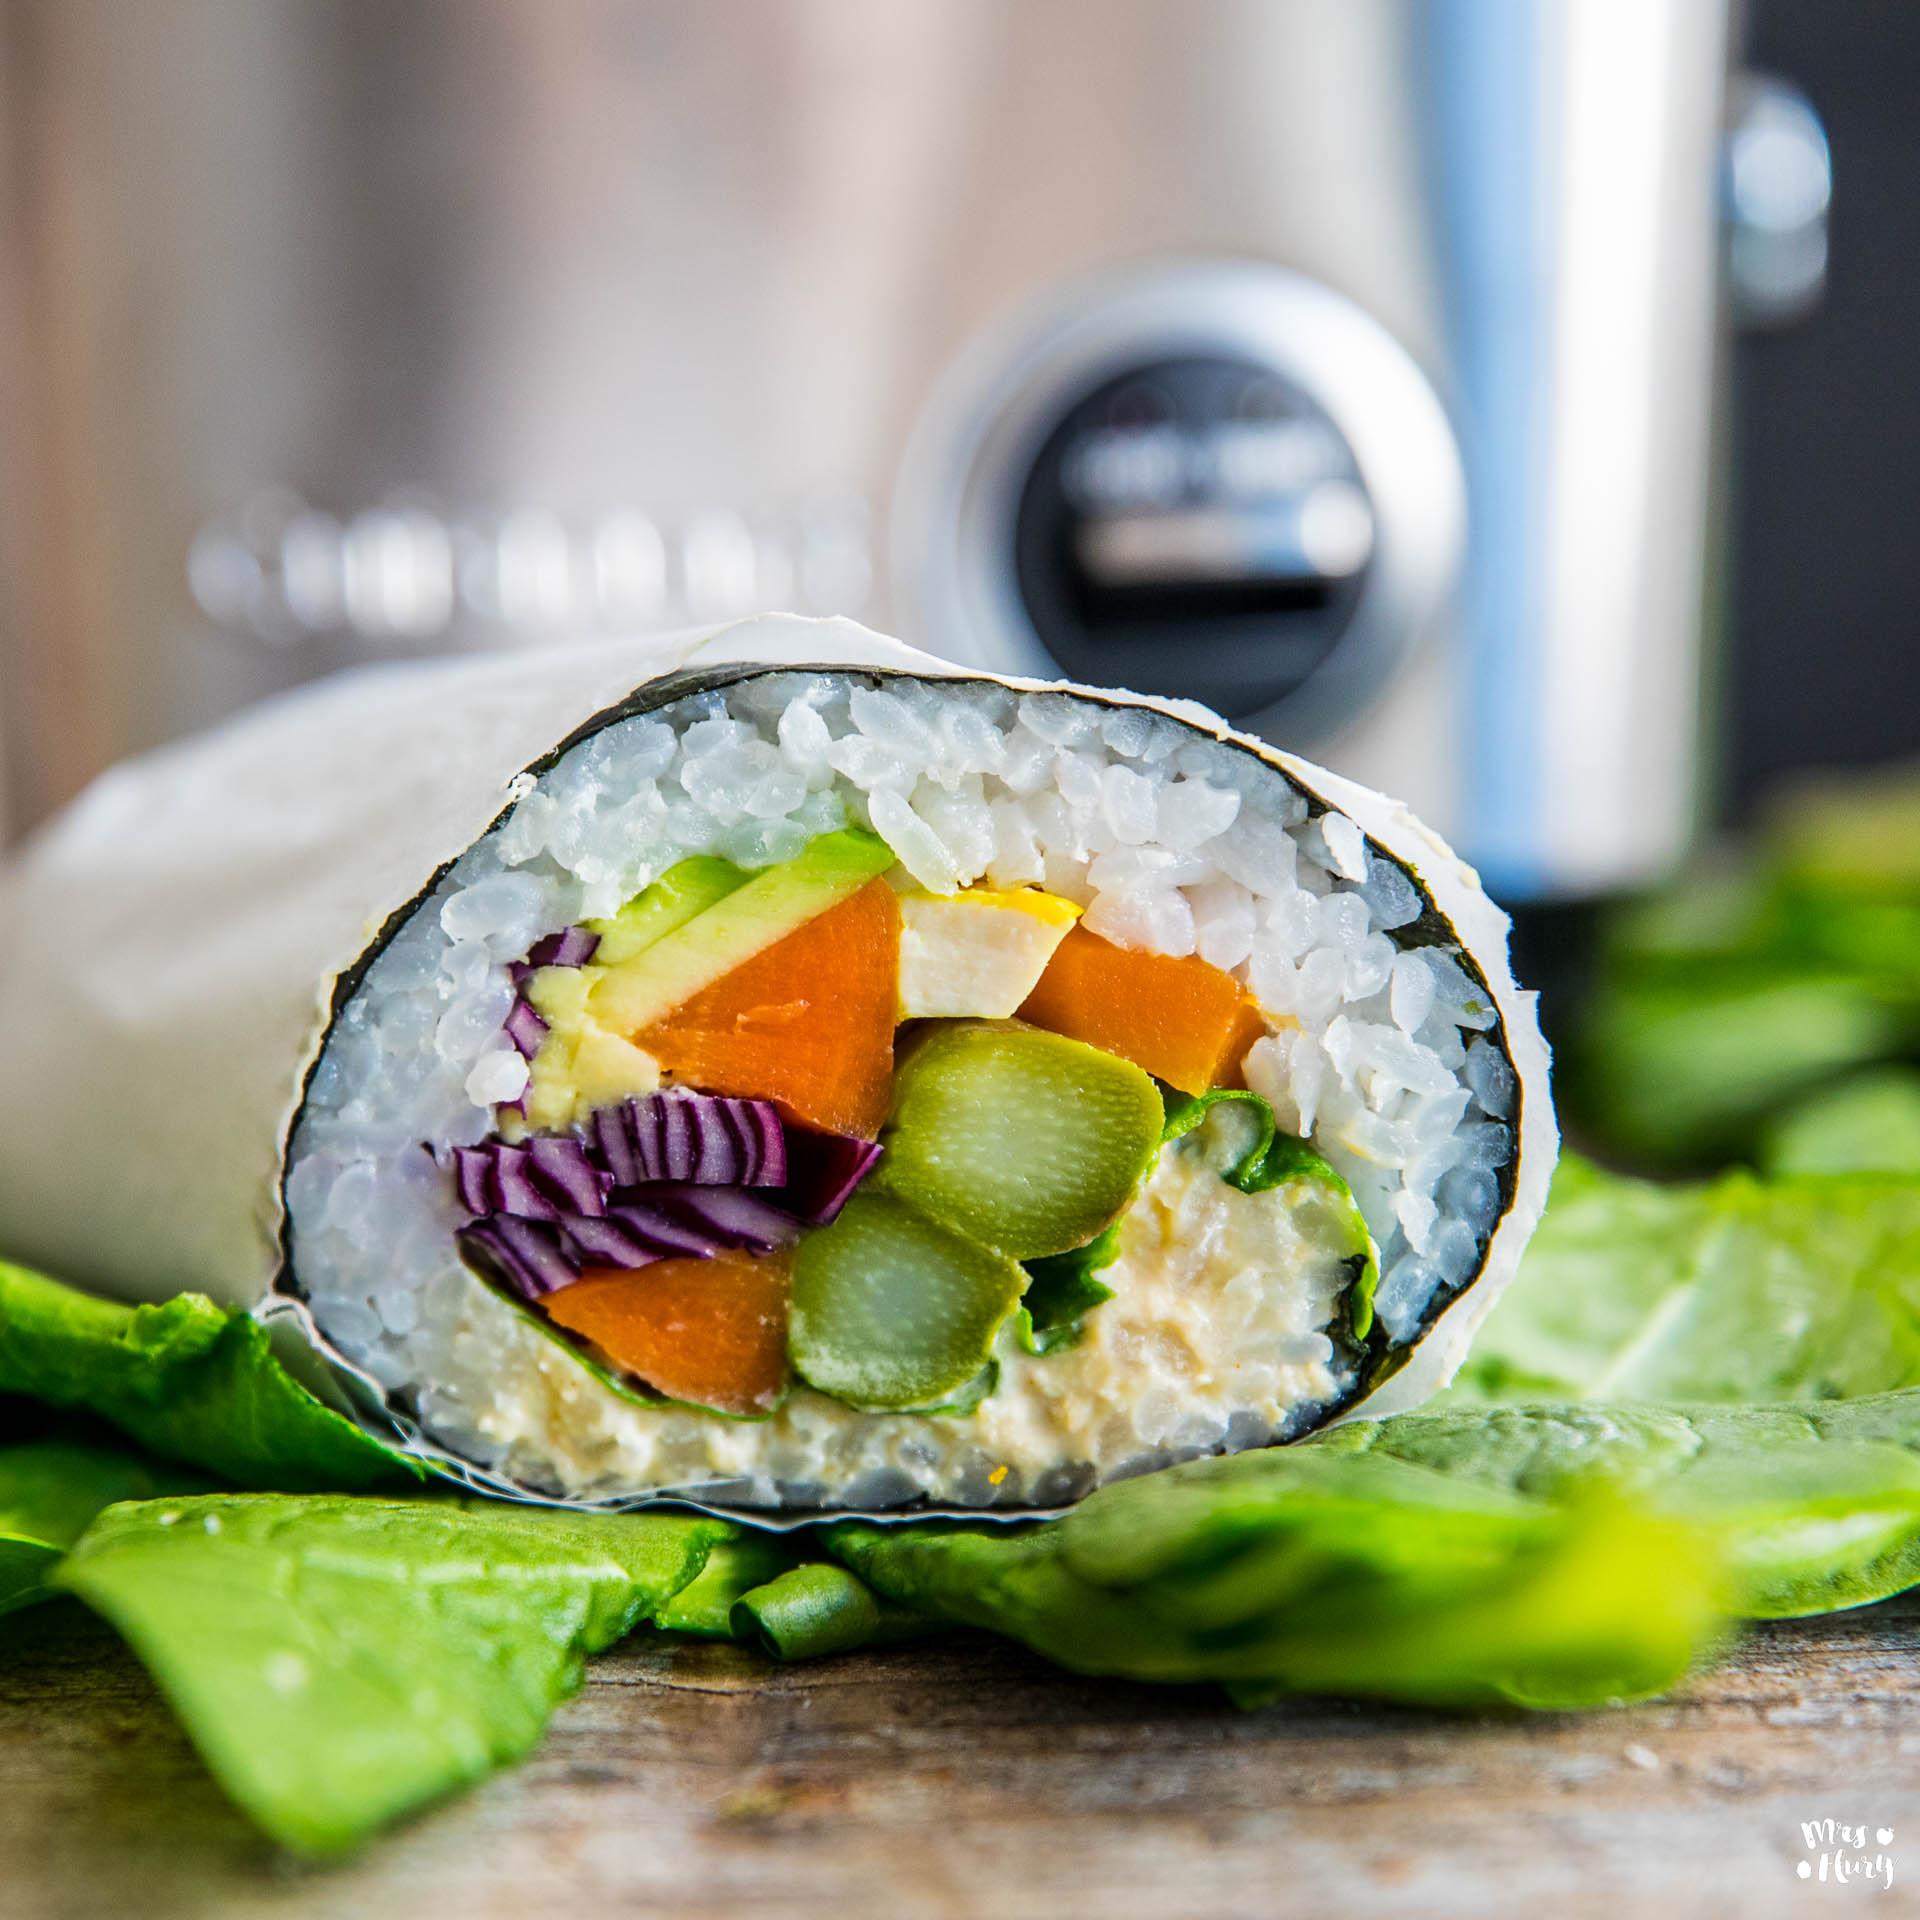 sushi burrito rezept vegan mrs flury gesund essen leben. Black Bedroom Furniture Sets. Home Design Ideas